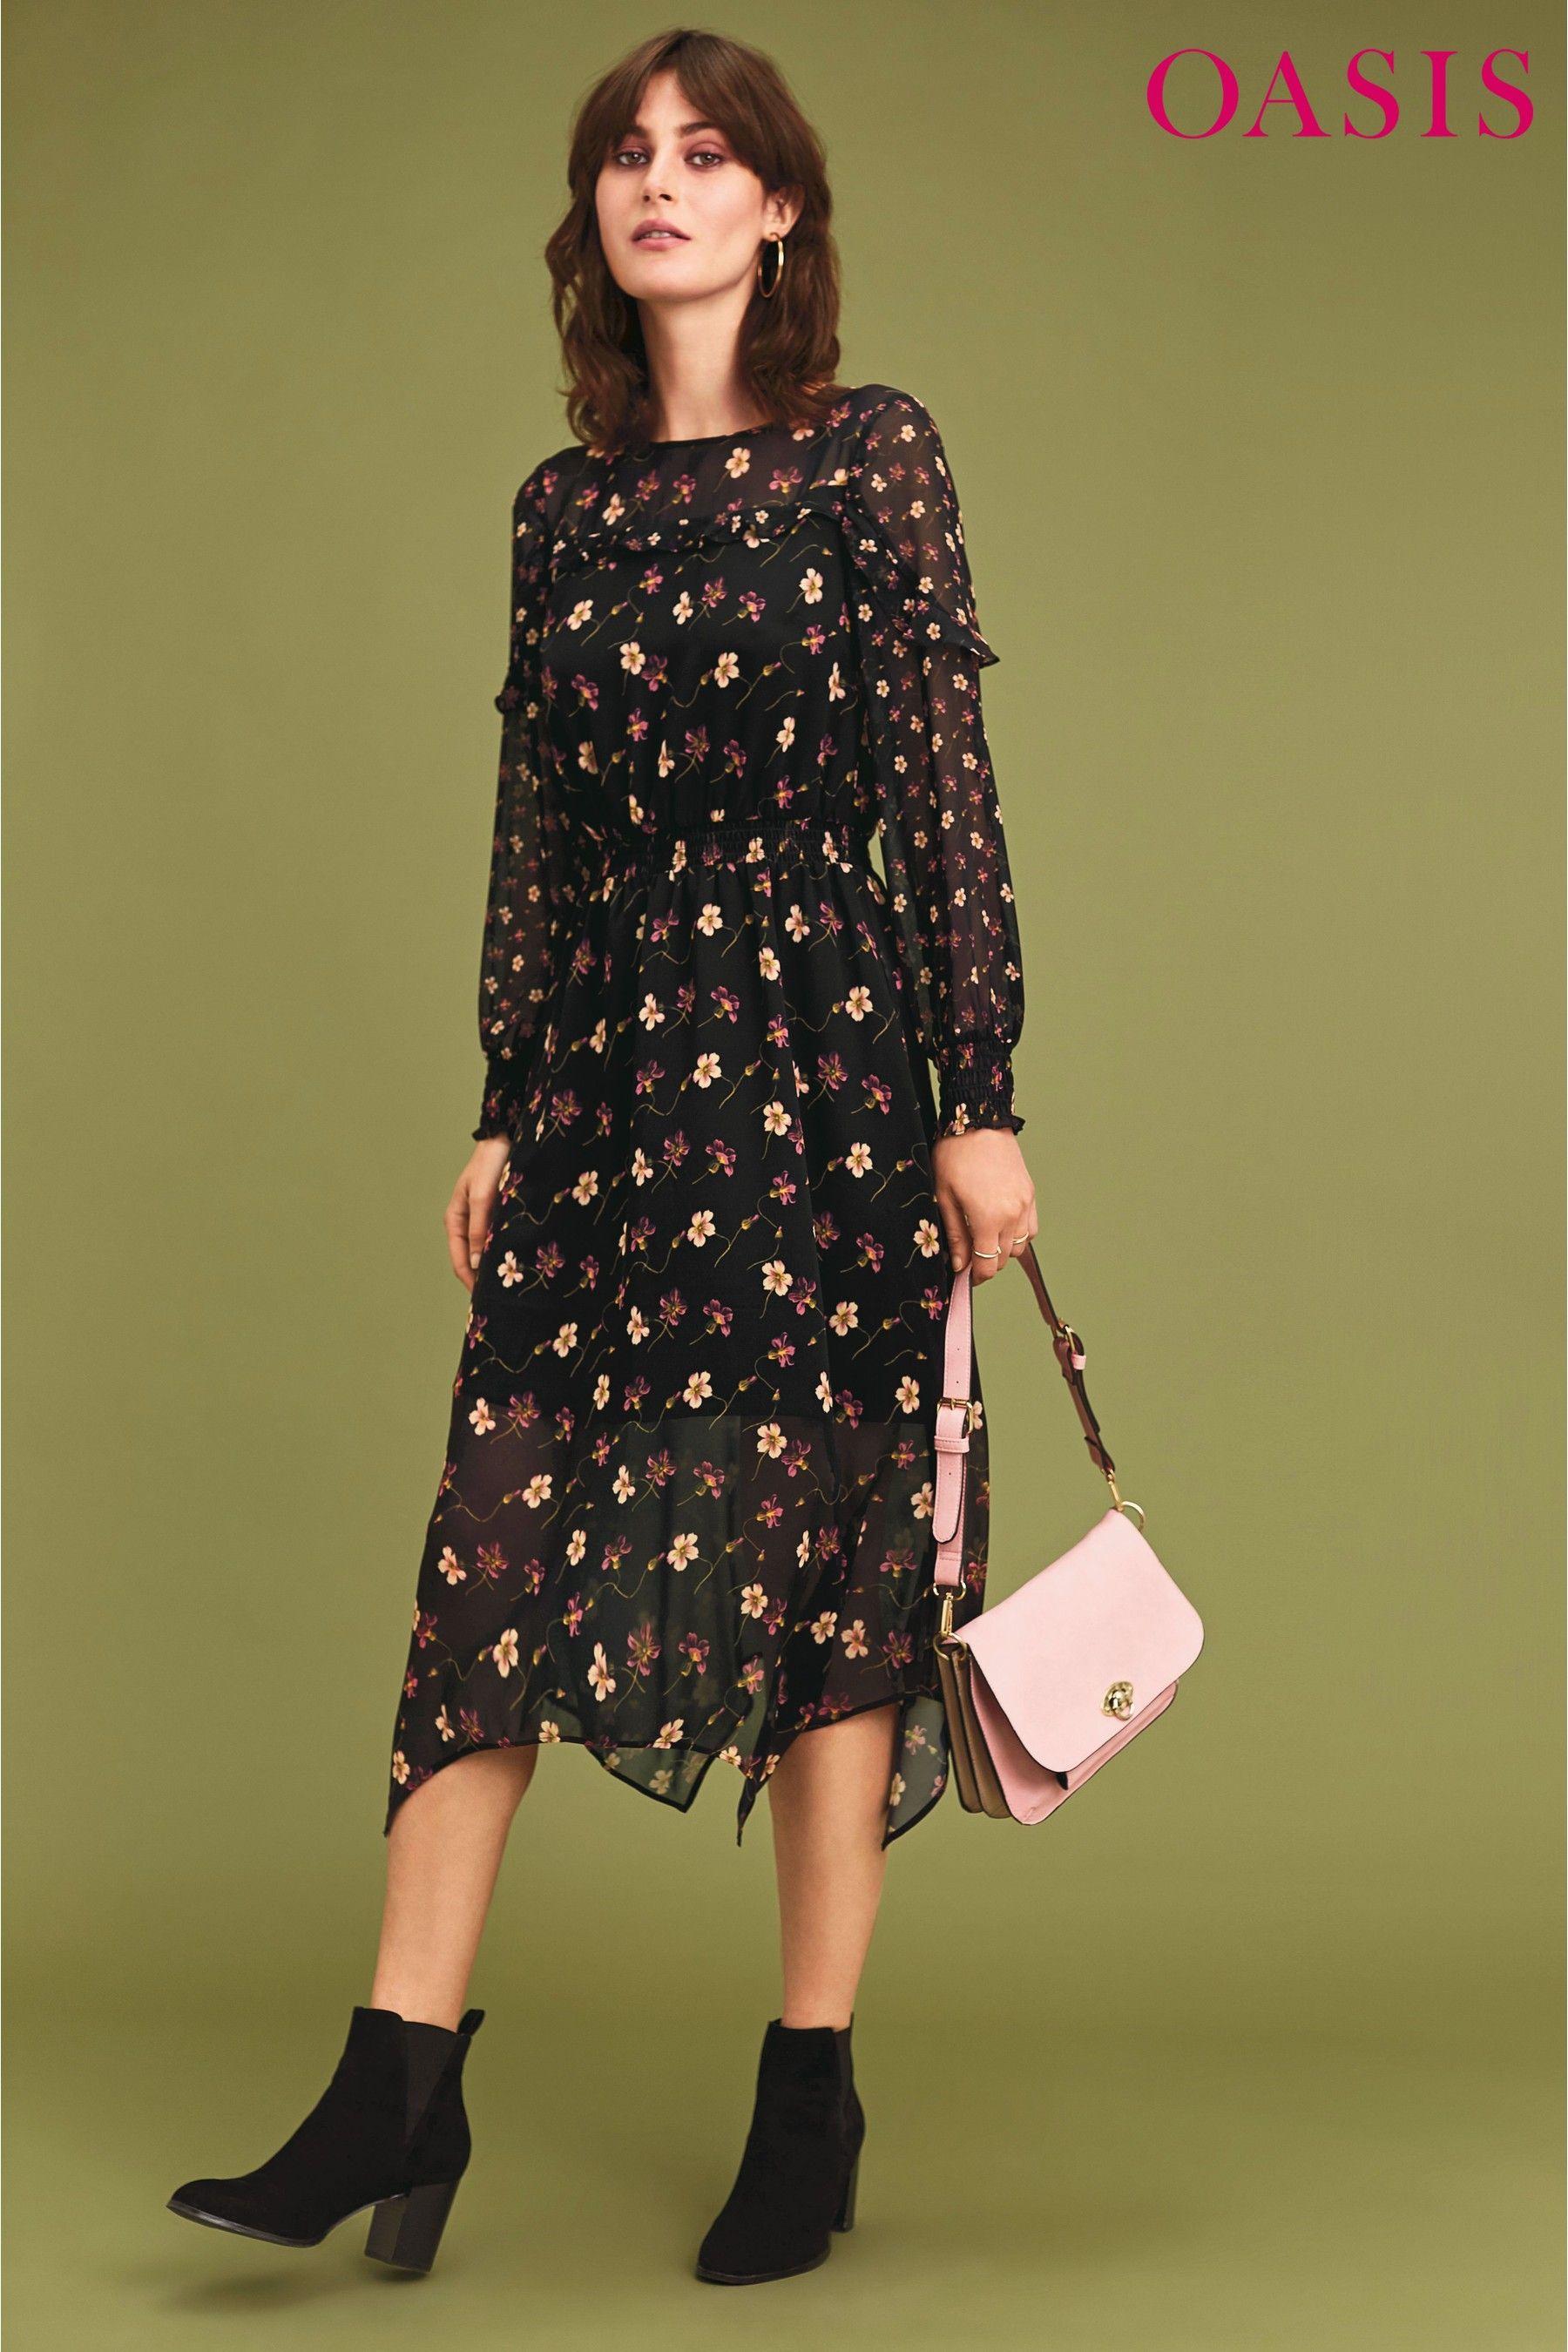 bf3febf8b454 Buy Oasis Black Frieda Floral Long Sleeve Chiffon Midi Dress from Next  Ireland